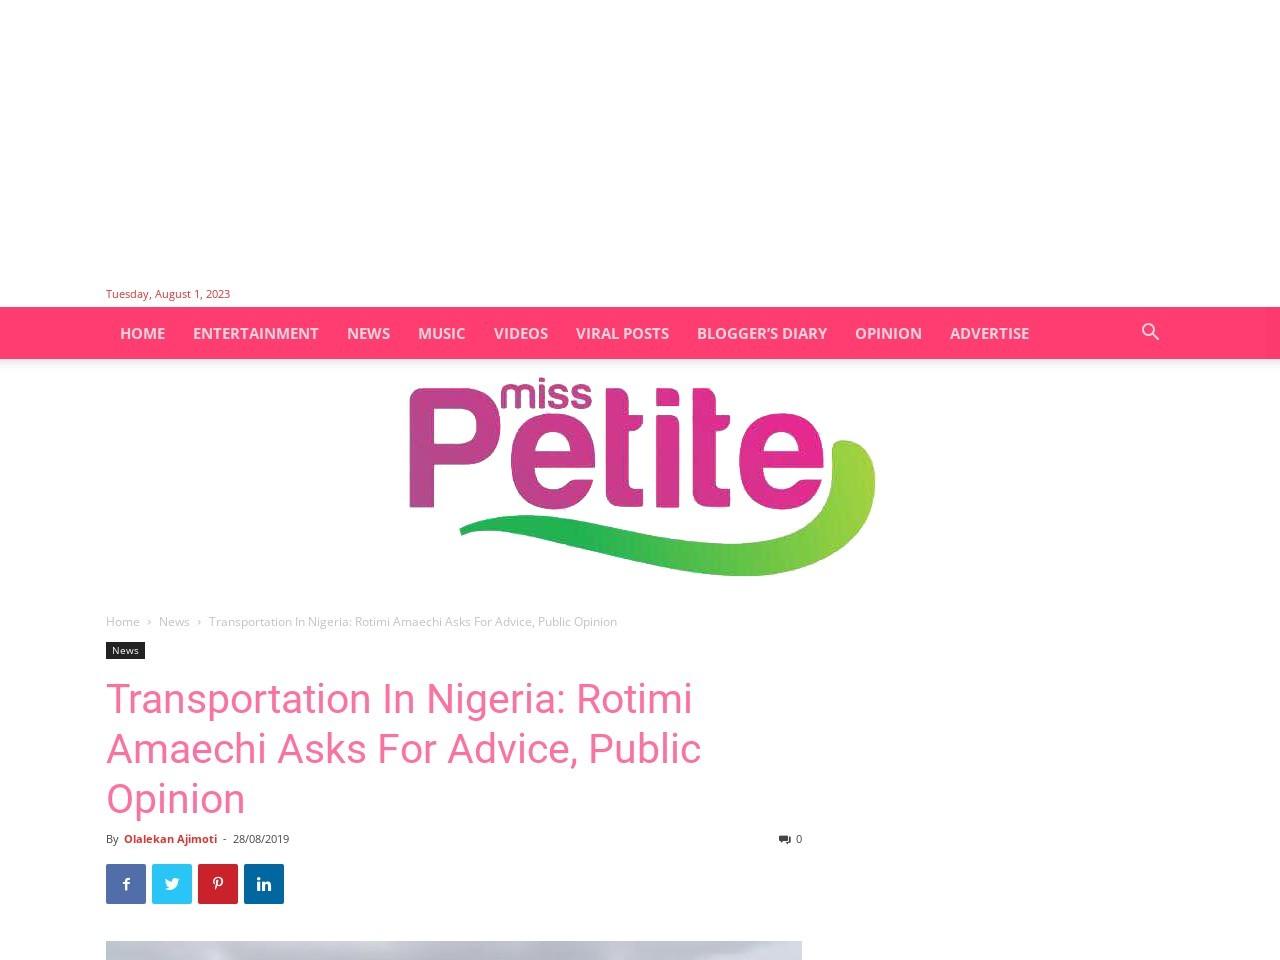 Transportation In Nigeria: Rotimi Amaechi Asks For Advice, Public Opinion